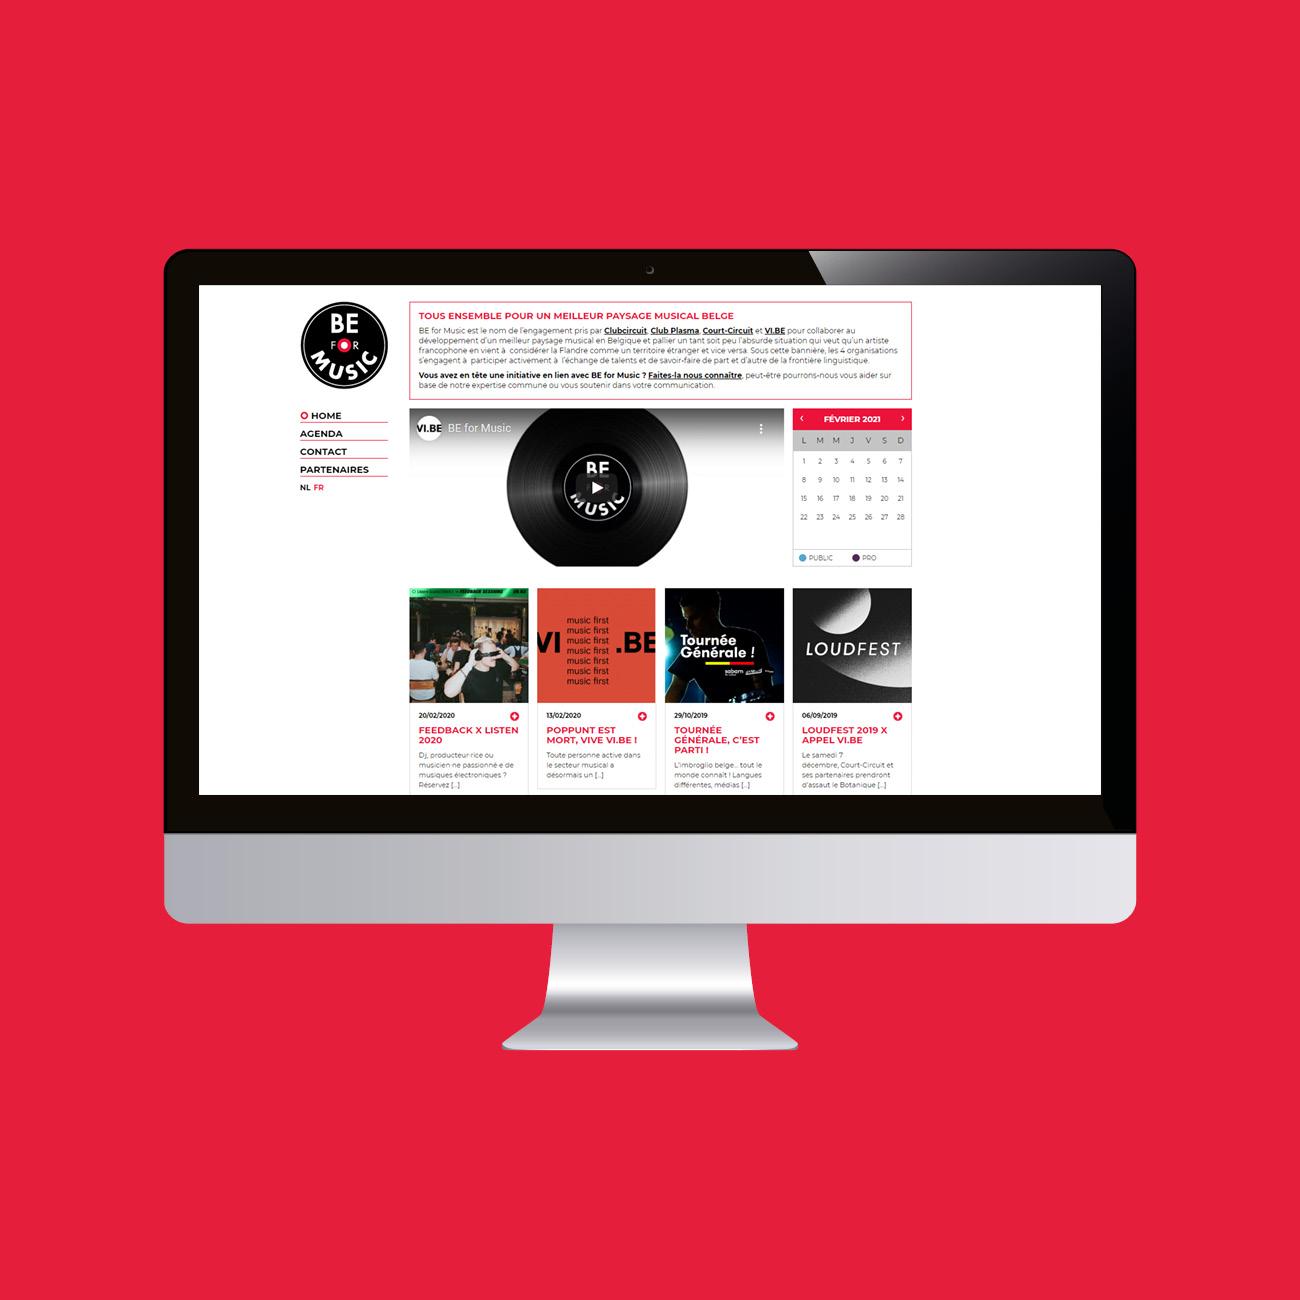 Miko Digital Agence web à Liège - Création site web BE for Music